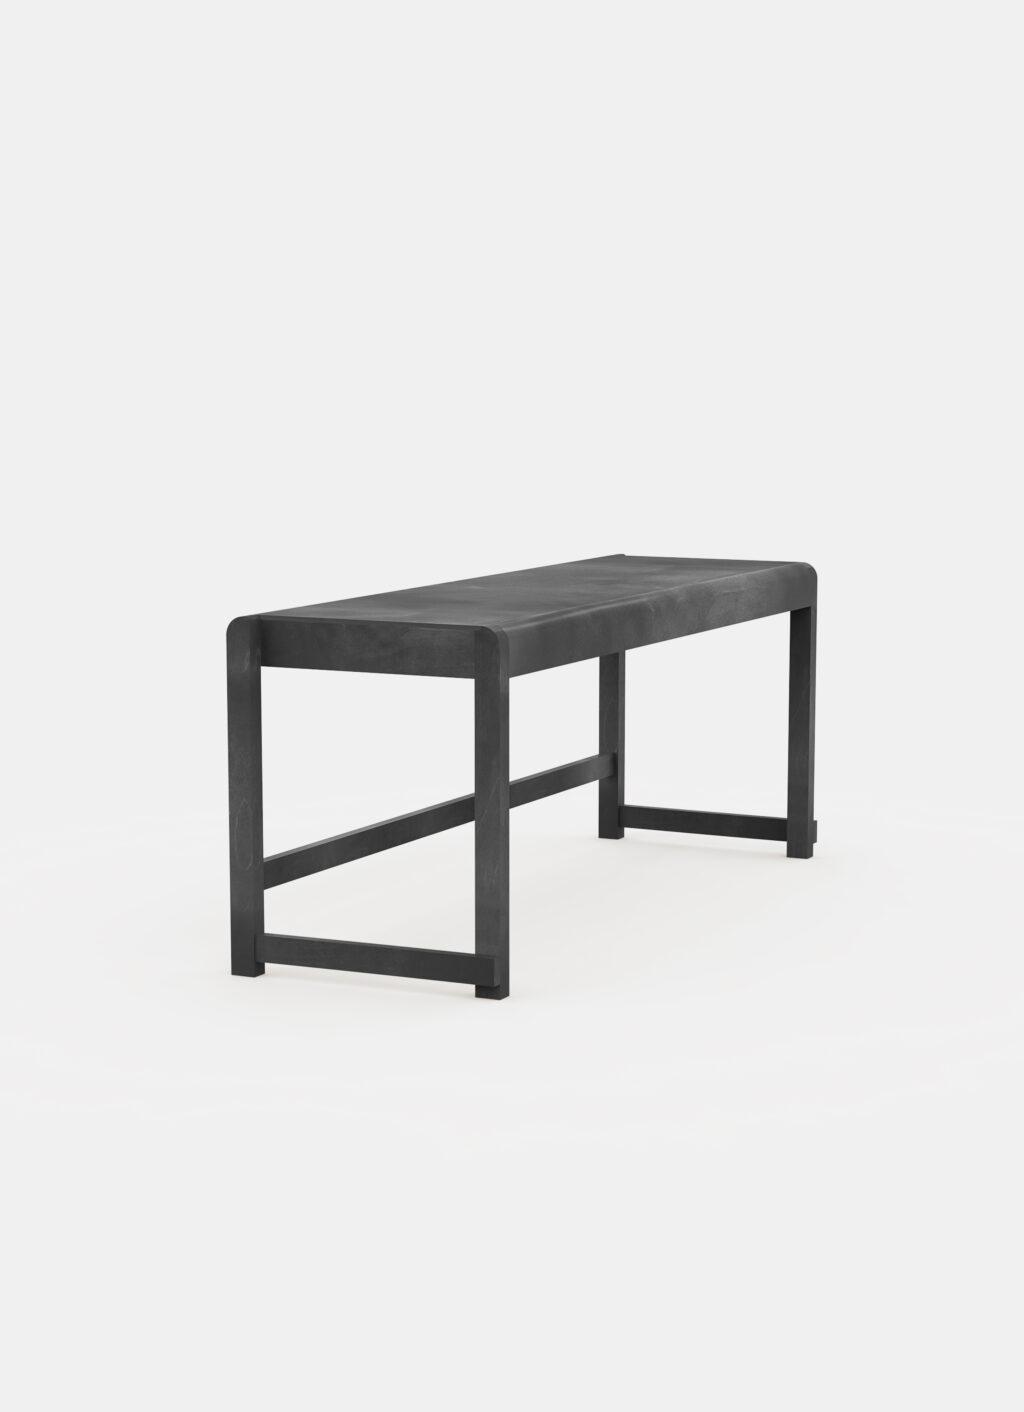 Frama - Bench 01 - Ash Black Wood